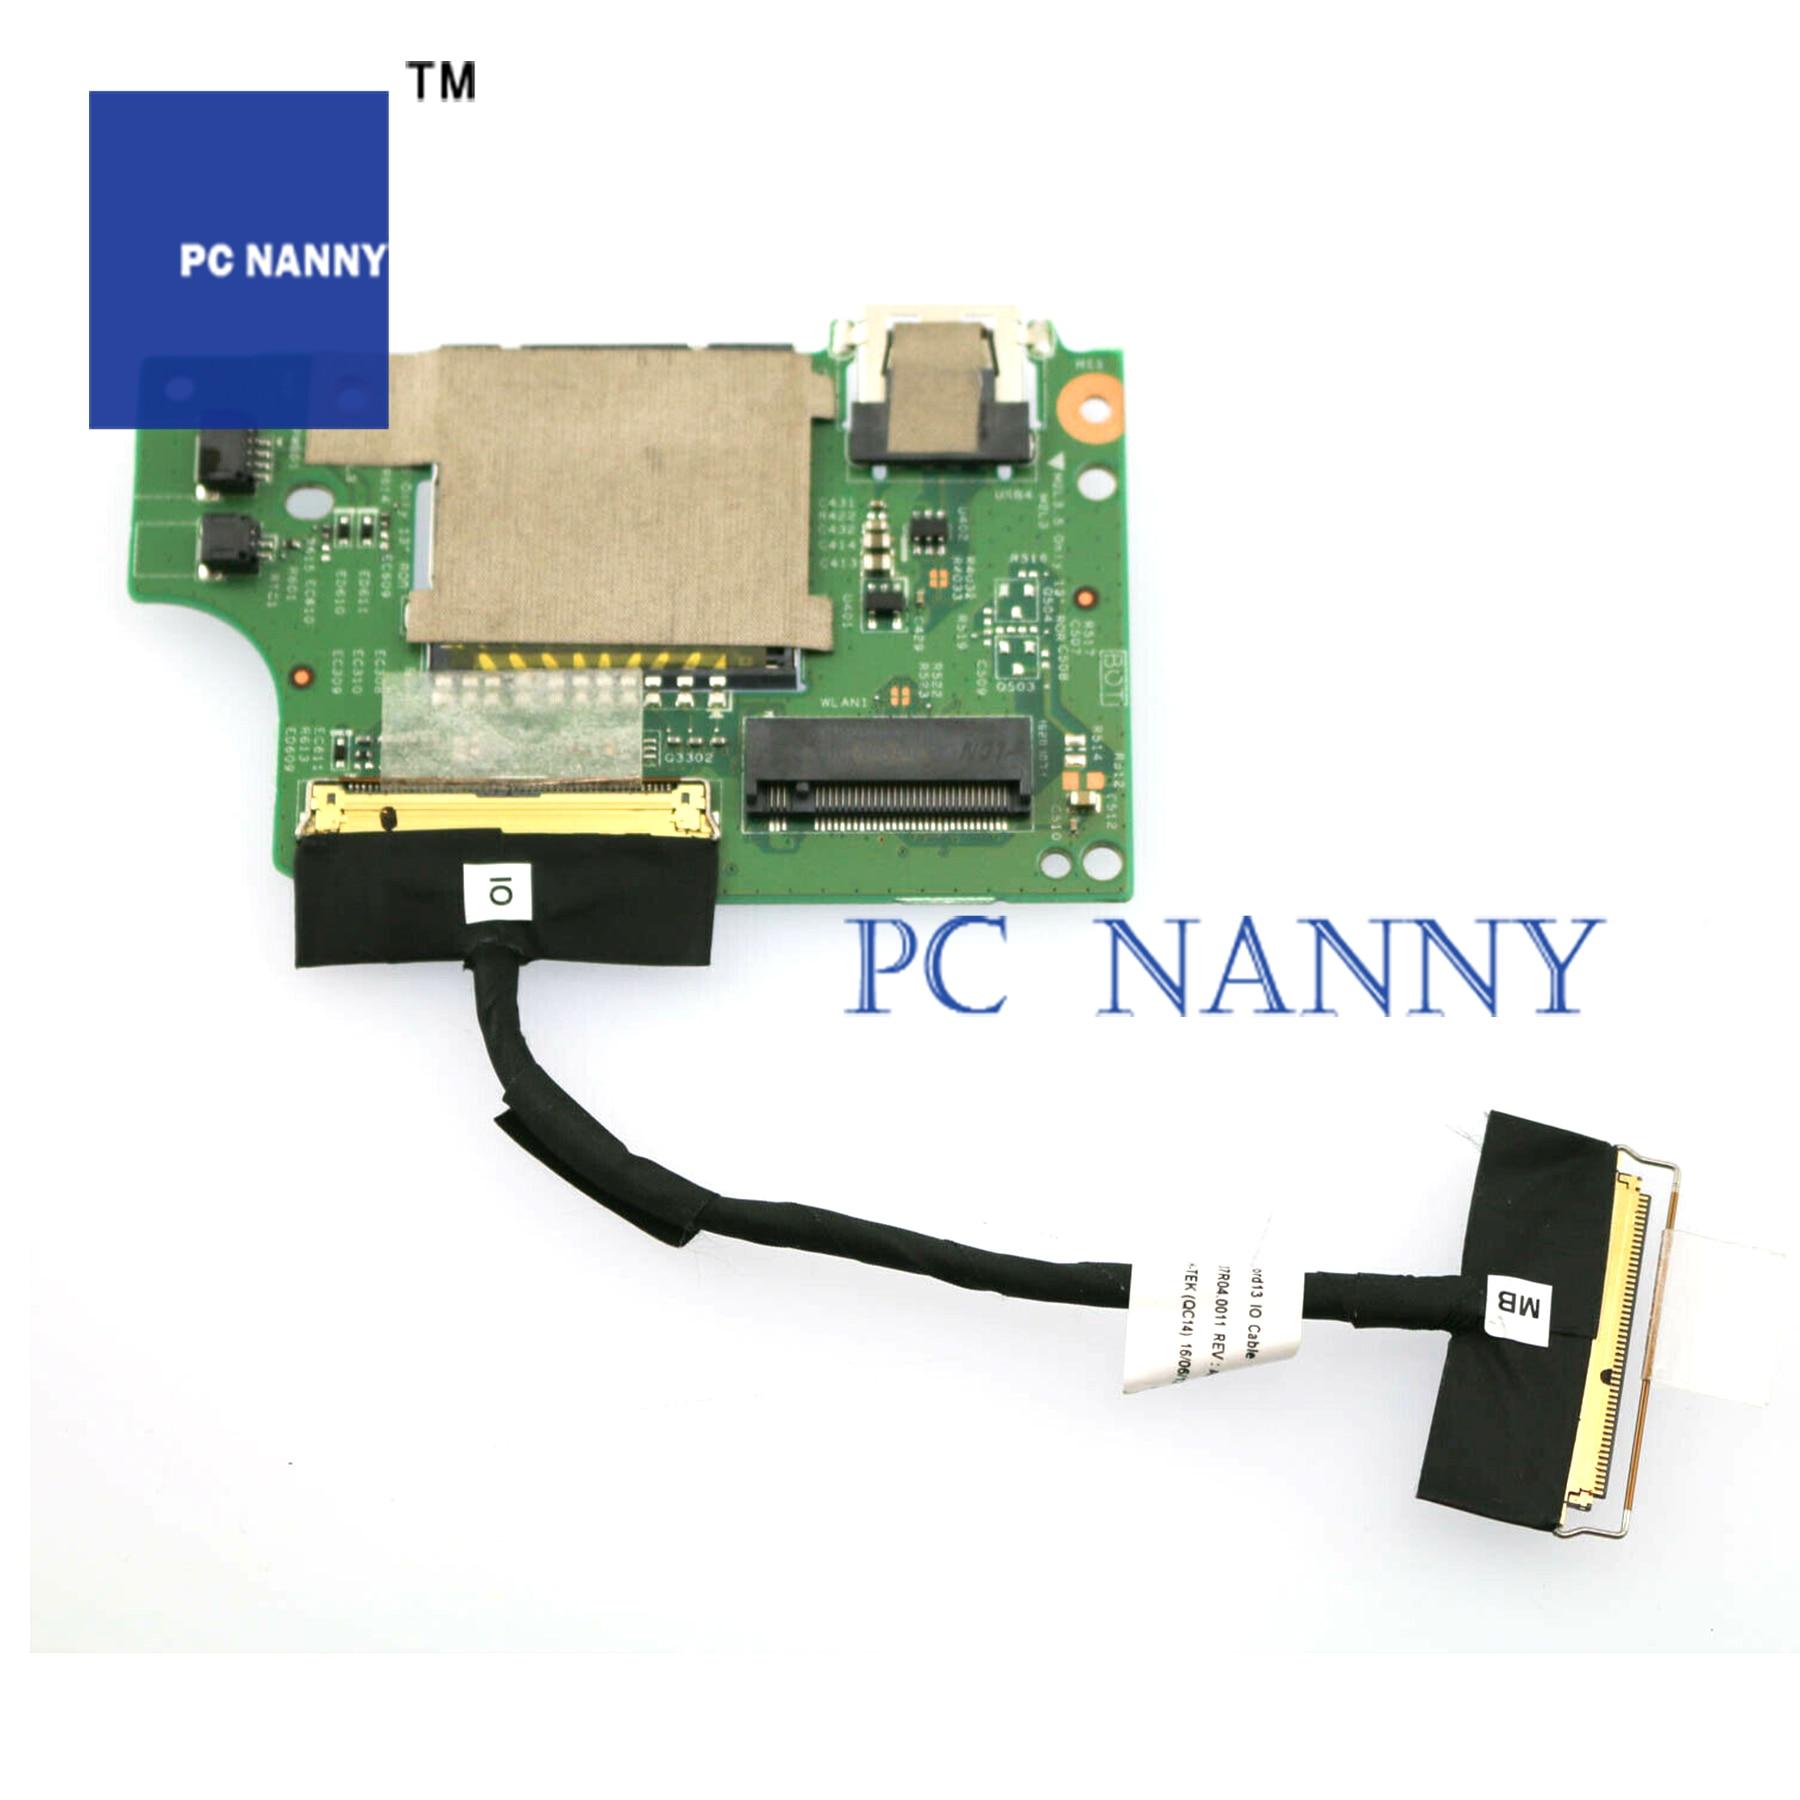 13 PCNANNY PARA Dell Inspiron 3379 7368 7378 7569 7579 7779 Leitor de Cartão USB Board w/Cabo y7tgp teste bom